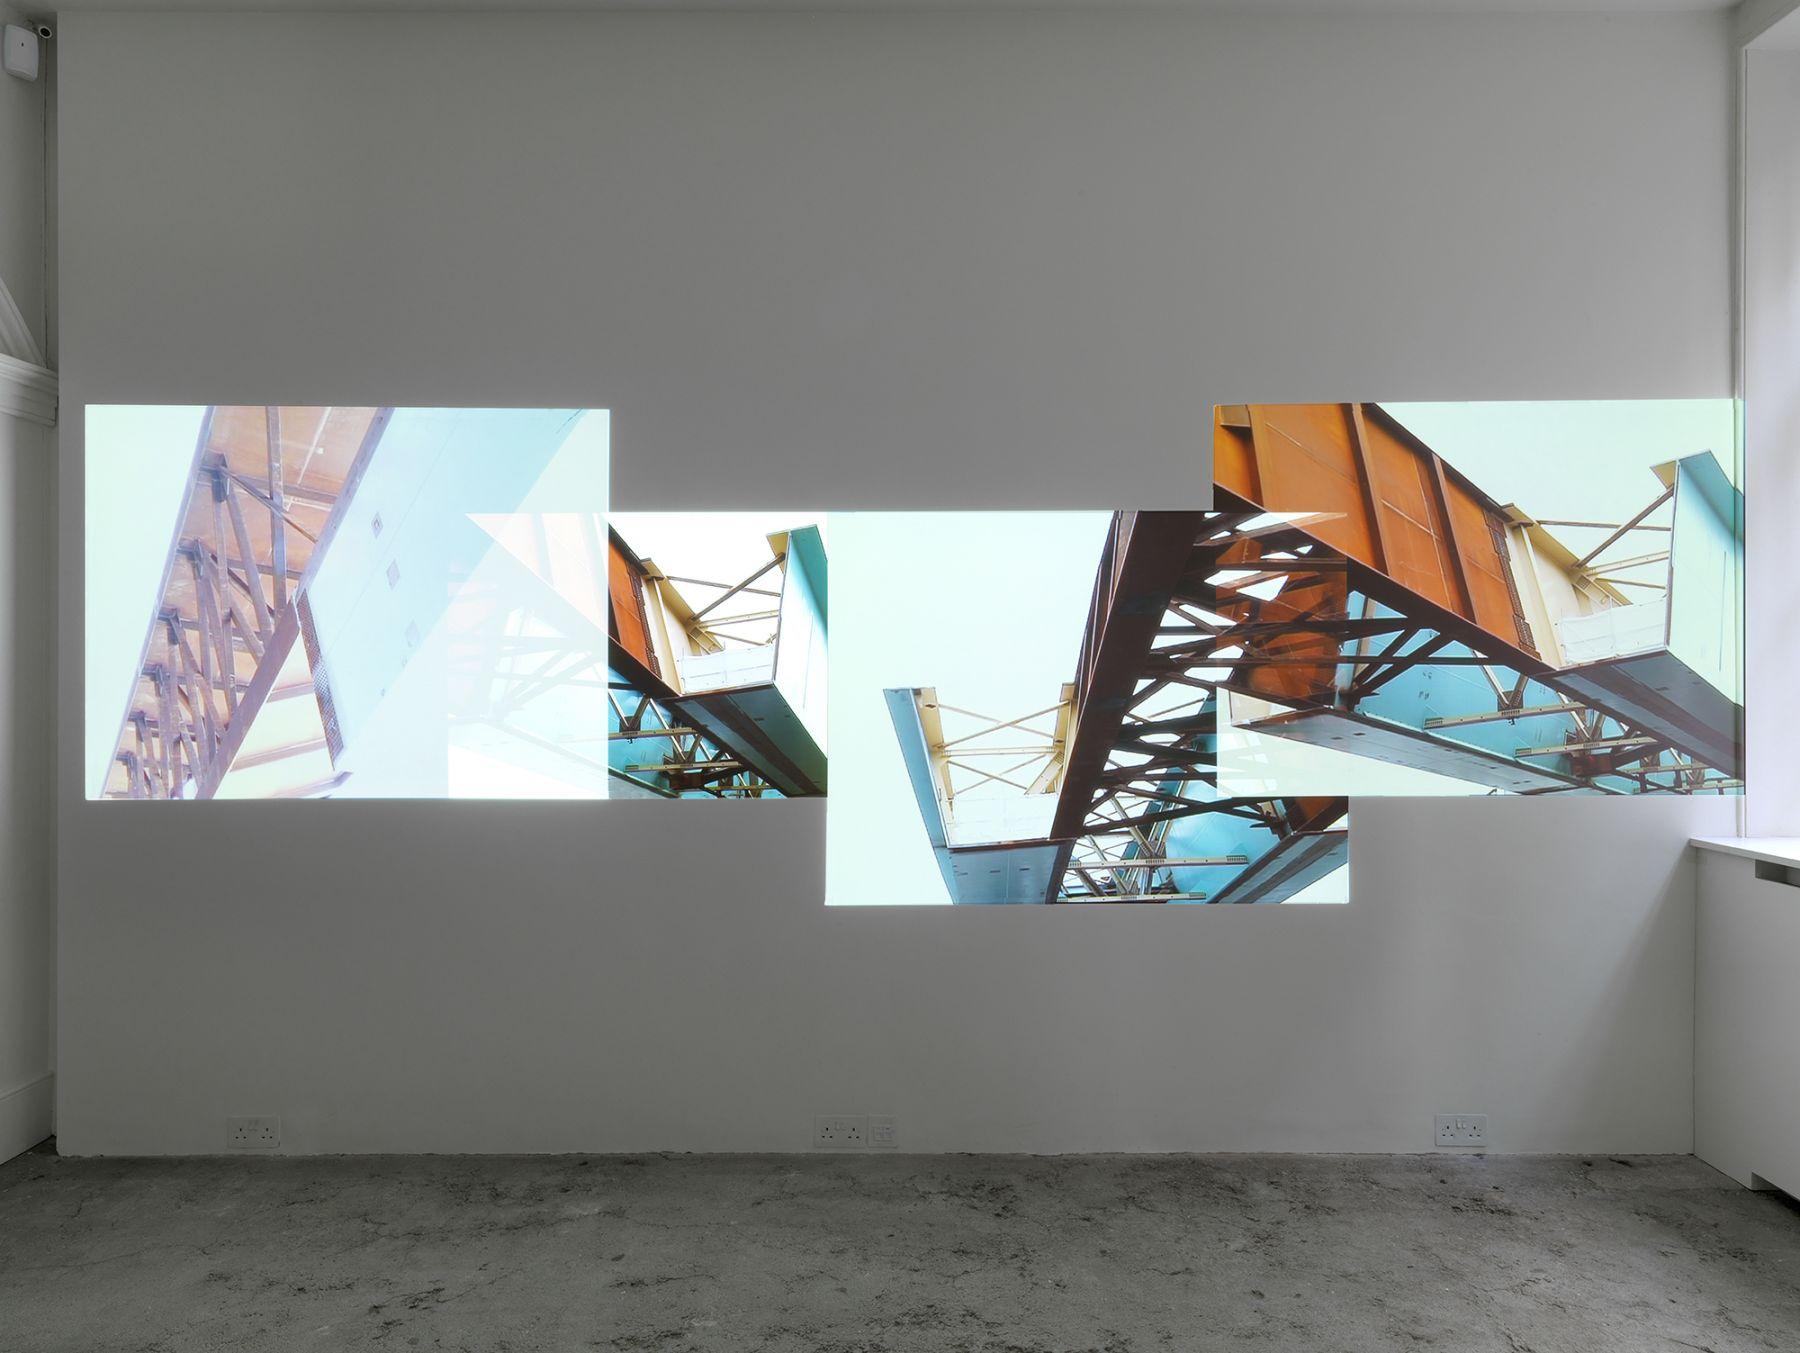 Installation view, Hilary Lloyd, Raven Row, London, 2010